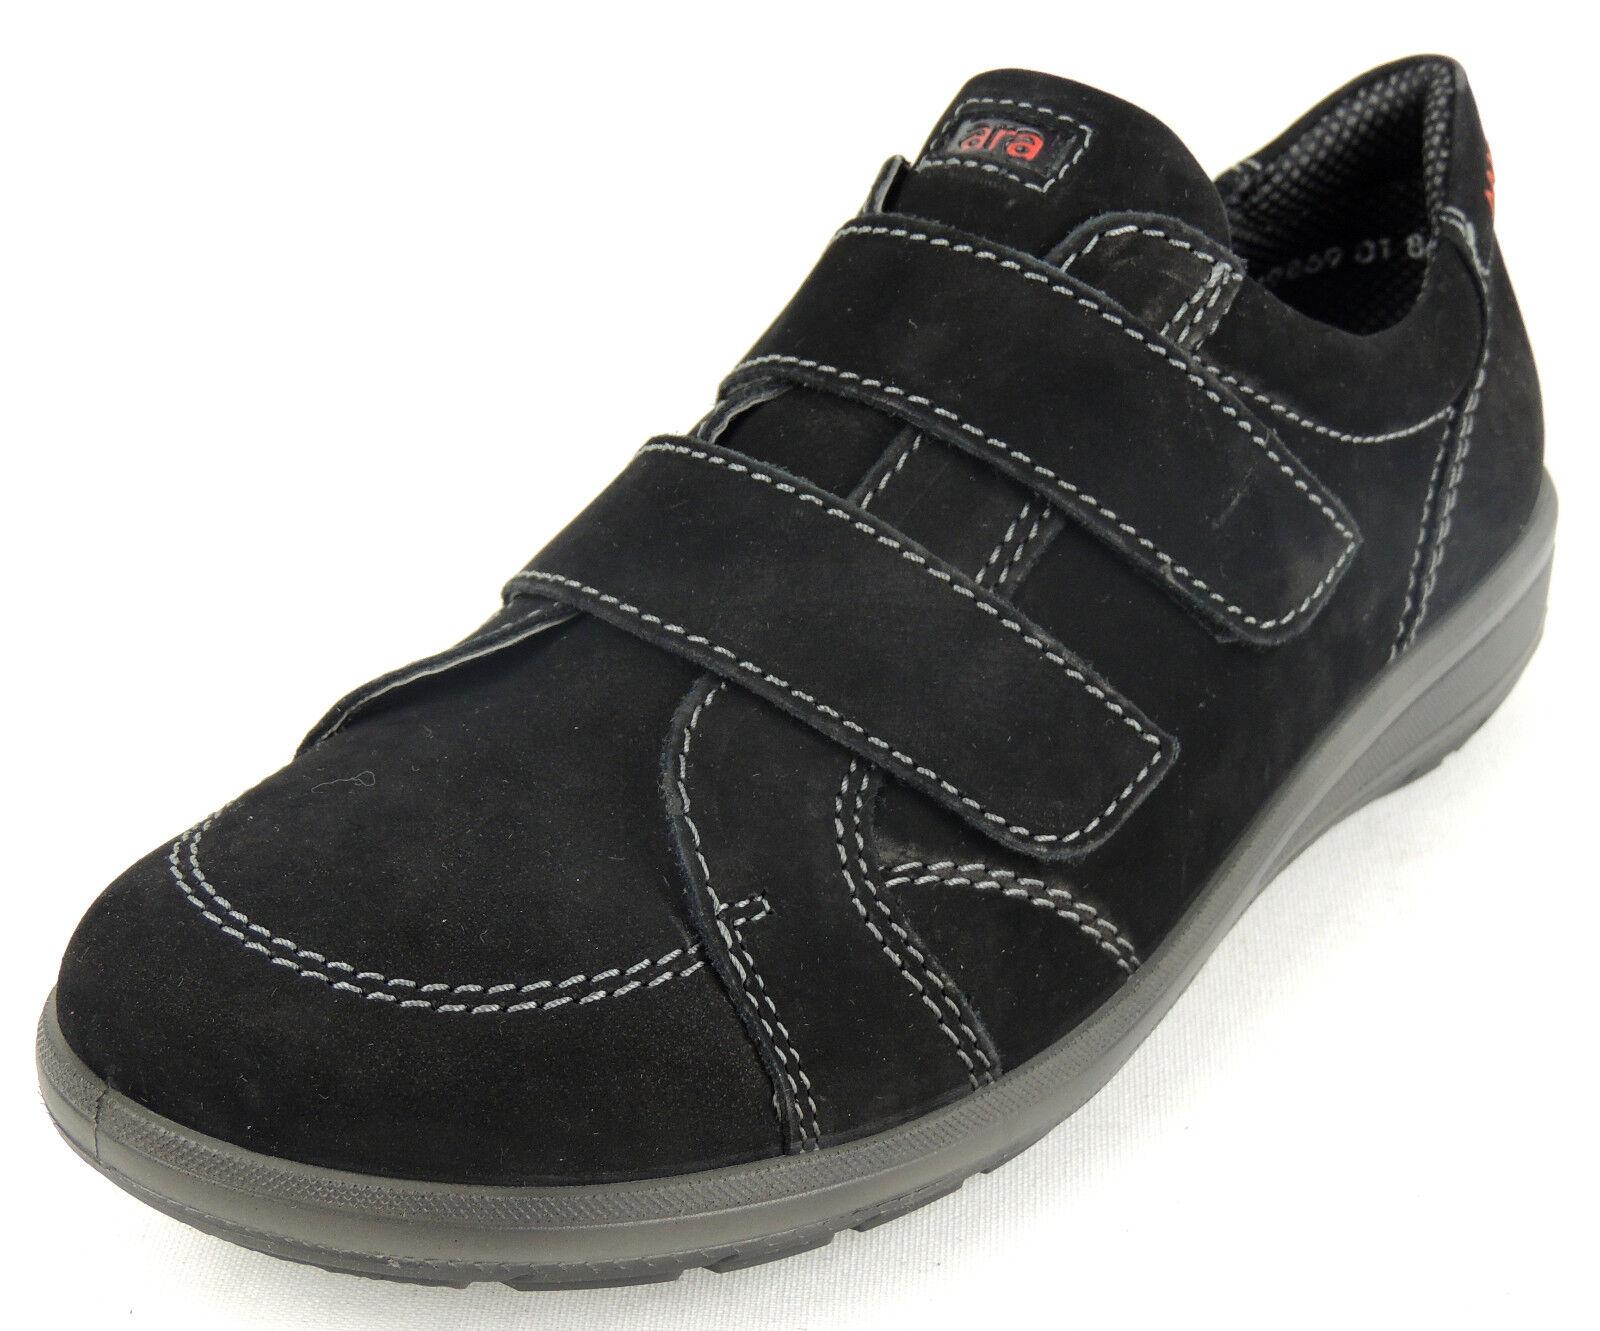 DIVINE FOLLIE 2315 nero scarpe frangia  donna spuntata tacco frangia scarpe 1cb3a3